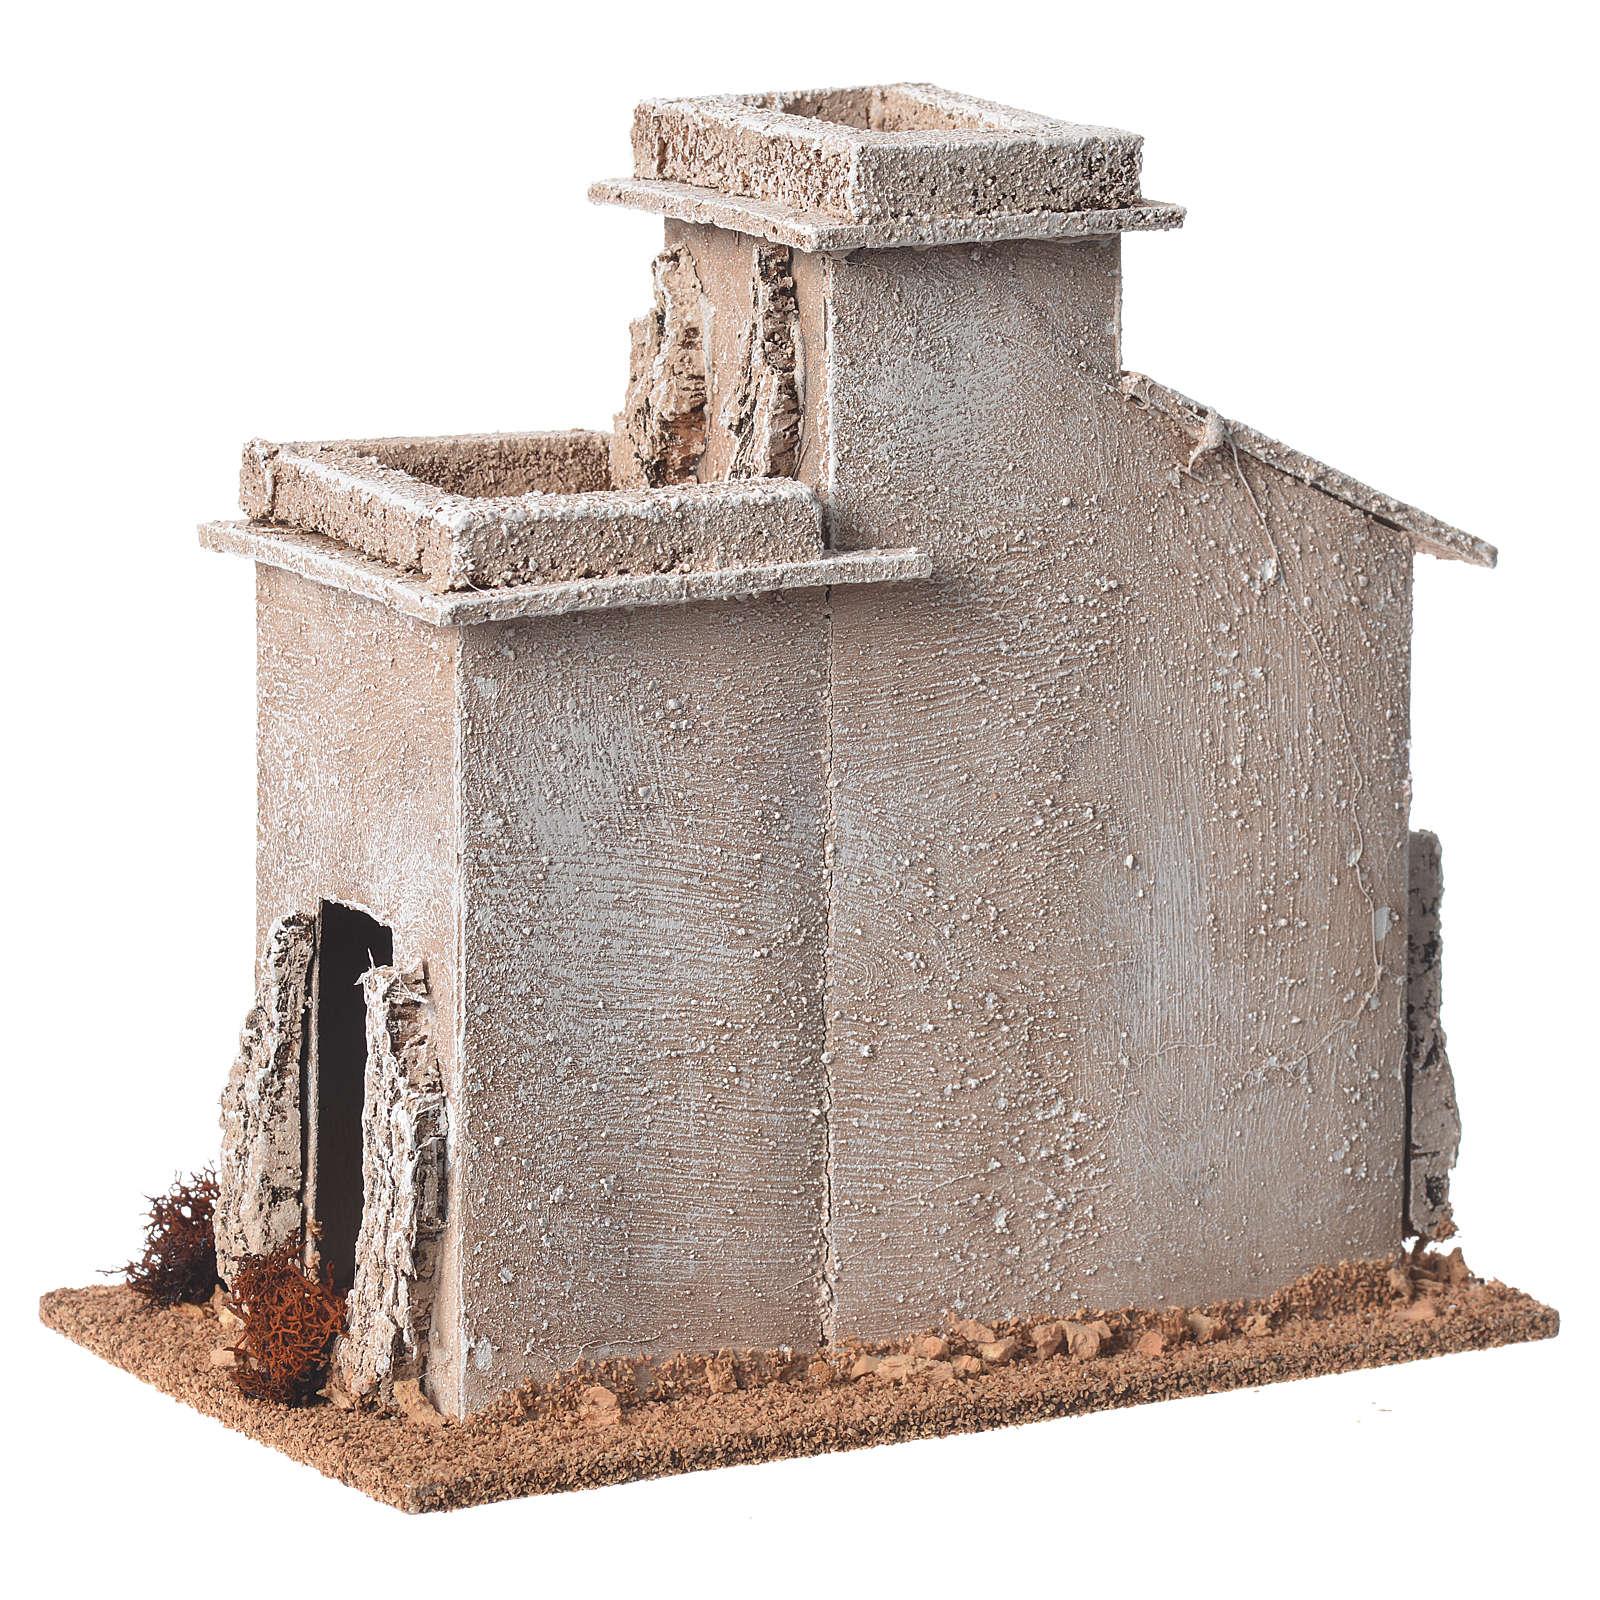 Minareto ambiente arabo presepe 17x15x12 cm 4